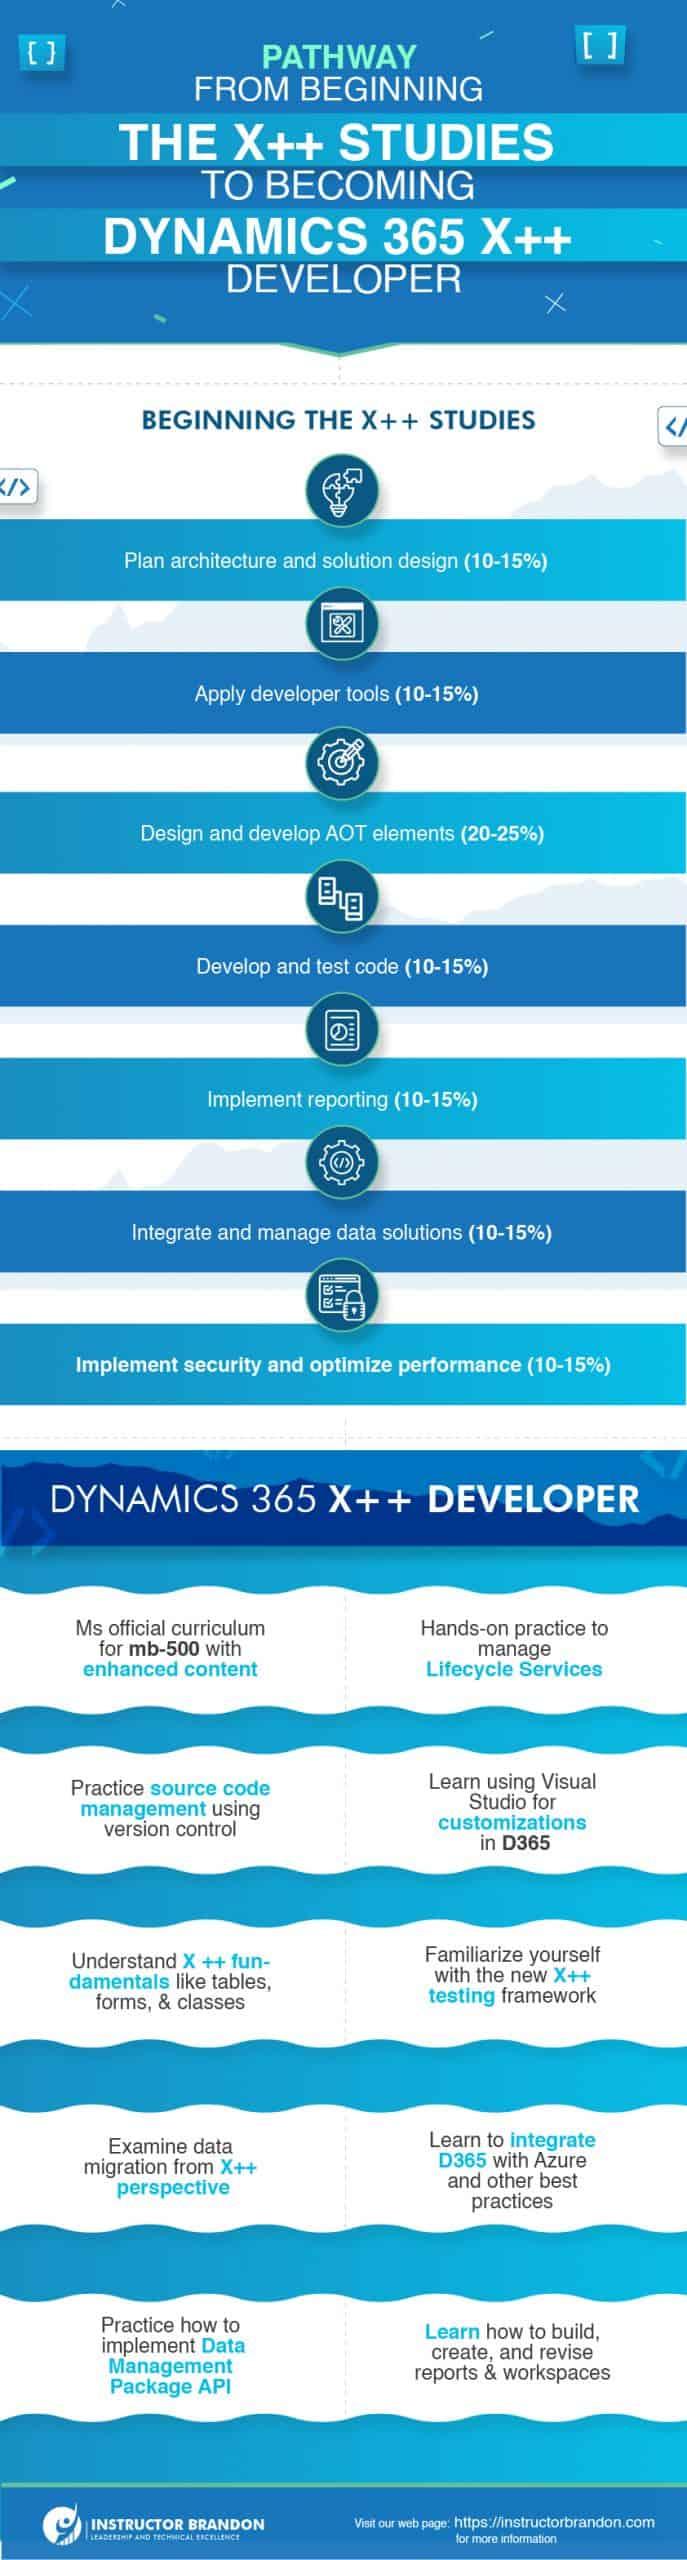 Become in a Dynamics 365 X++ Developer